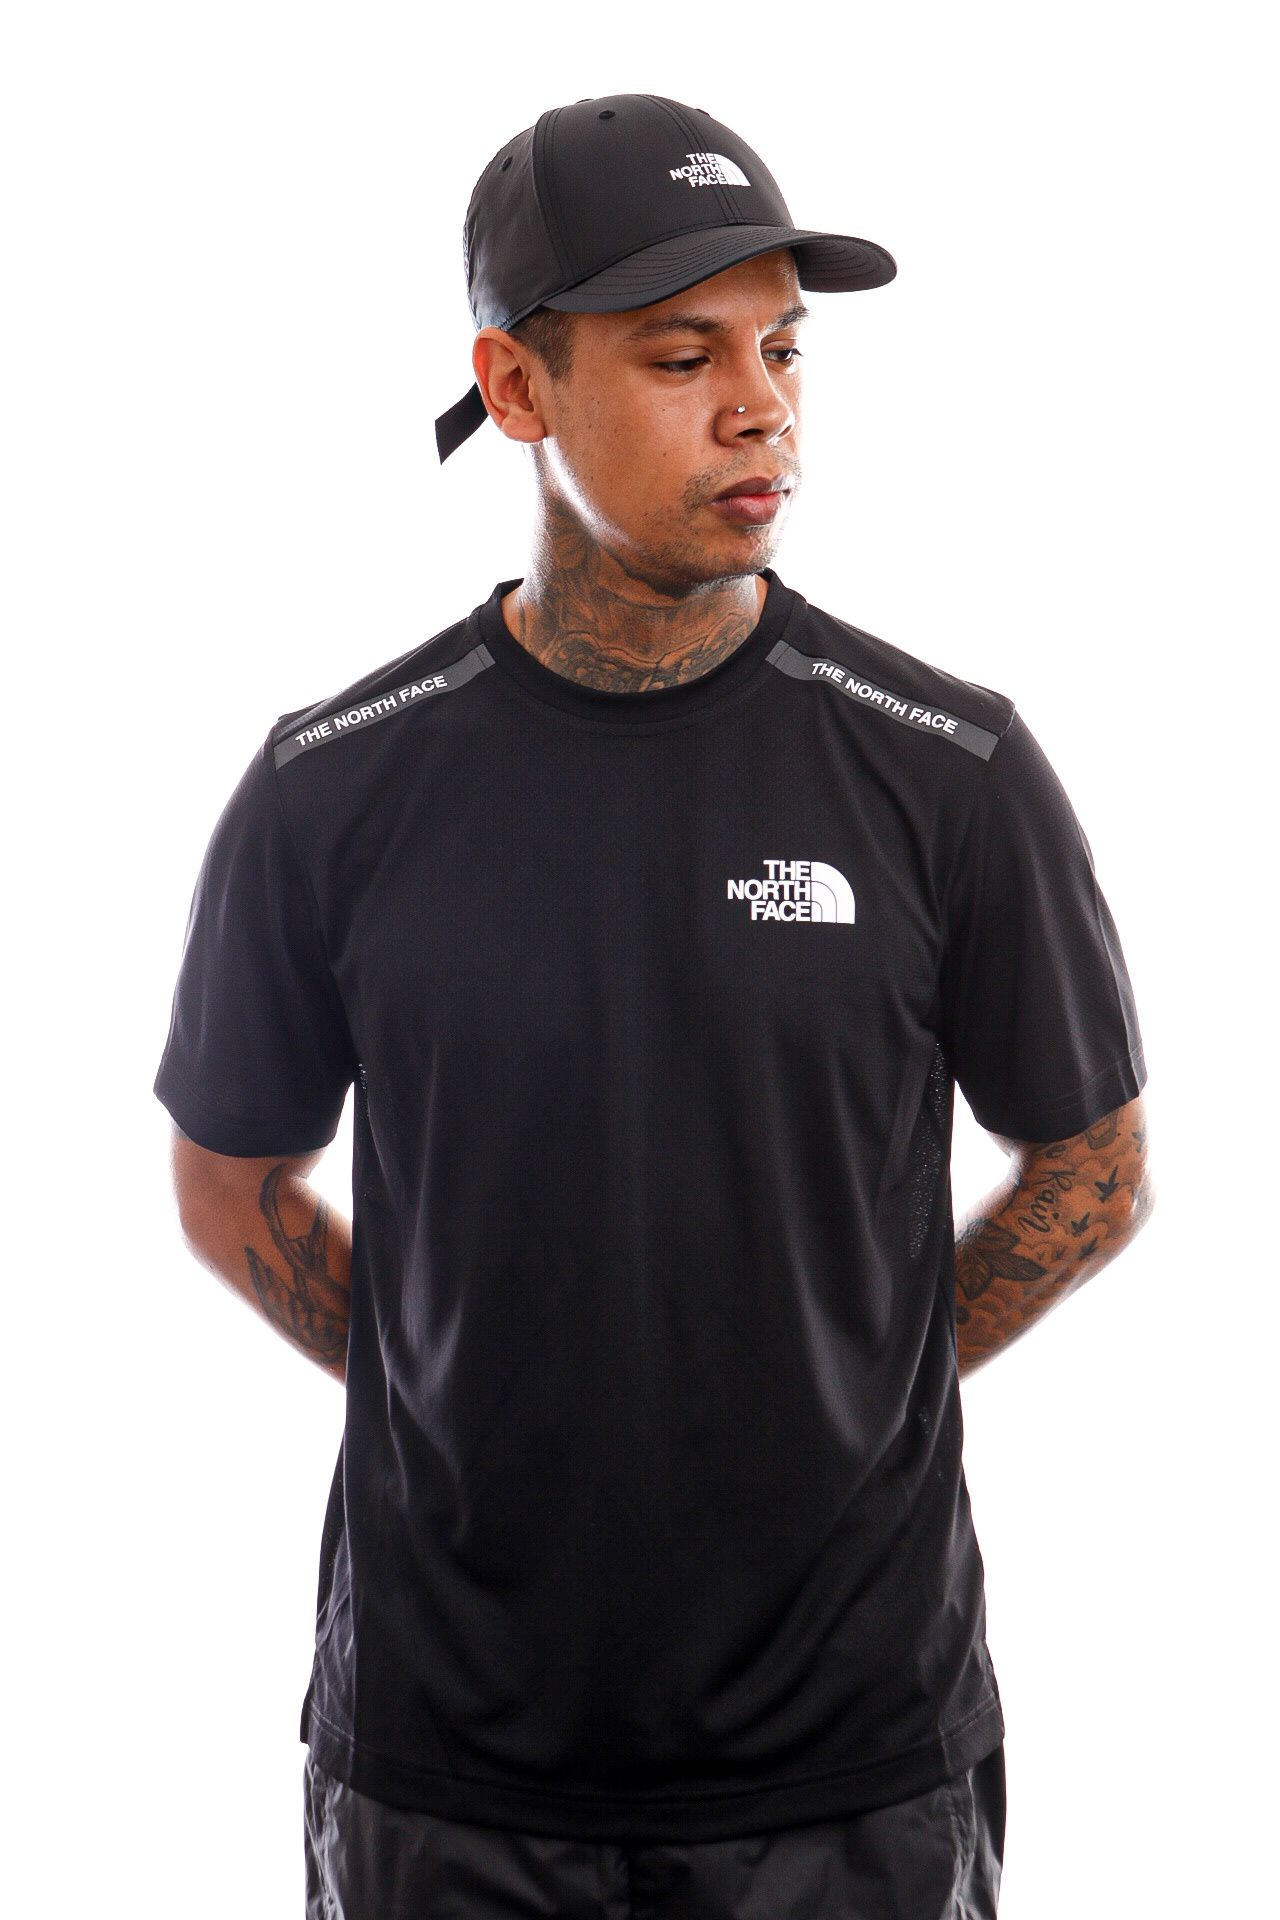 Afbeelding van The North Face T-shirt Mens MA S/S Tee TNF Black NF0A5578JK31